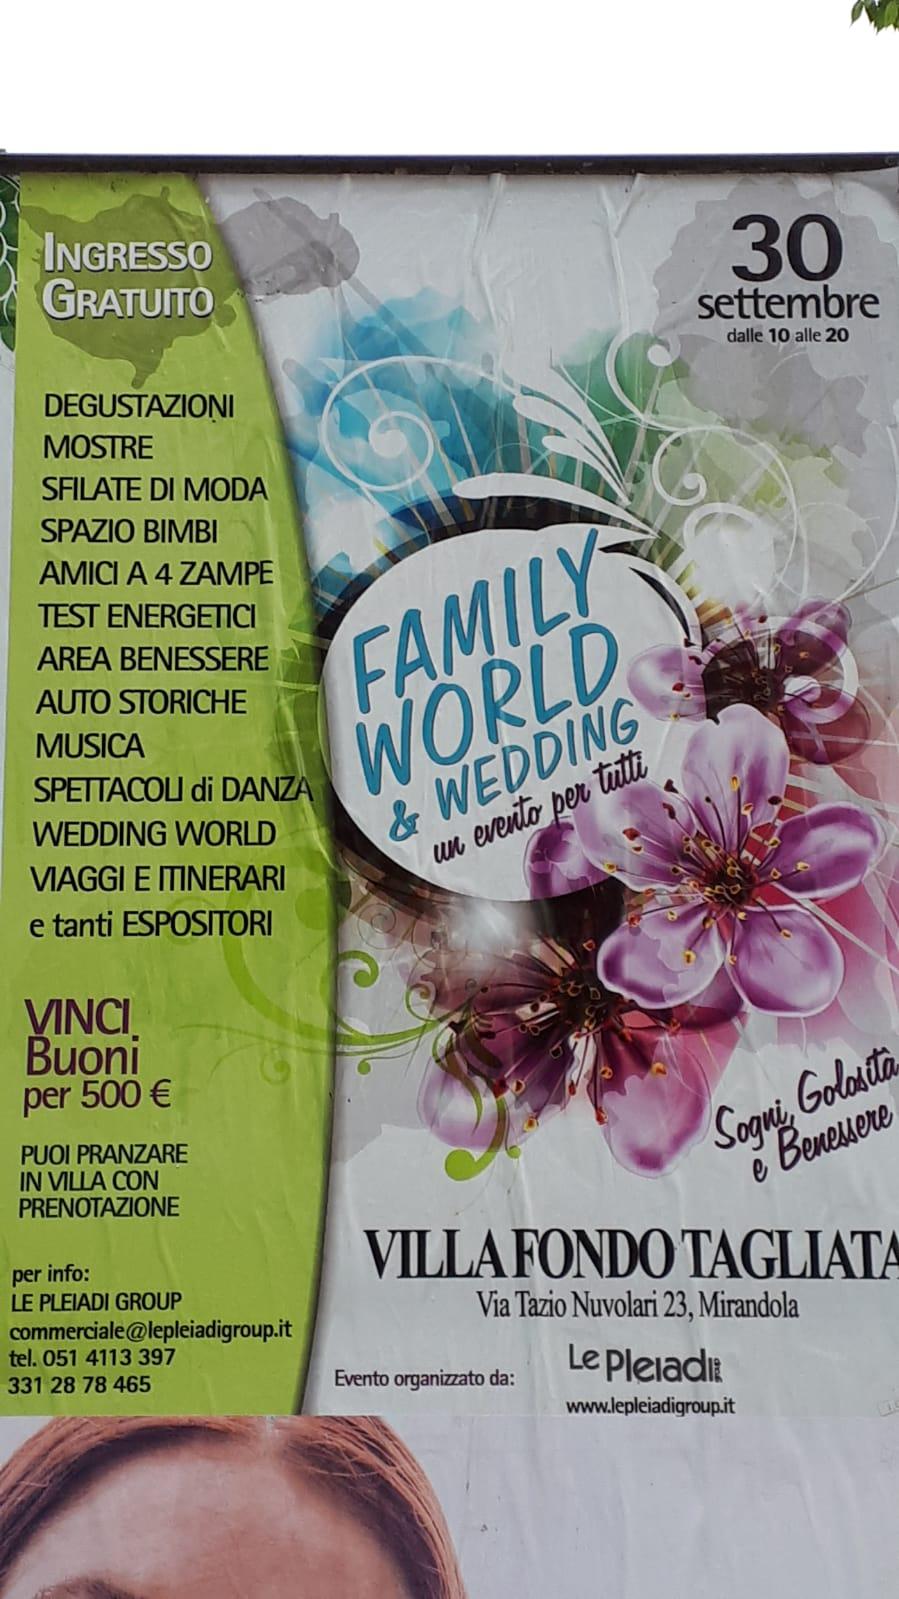 family world & wedding